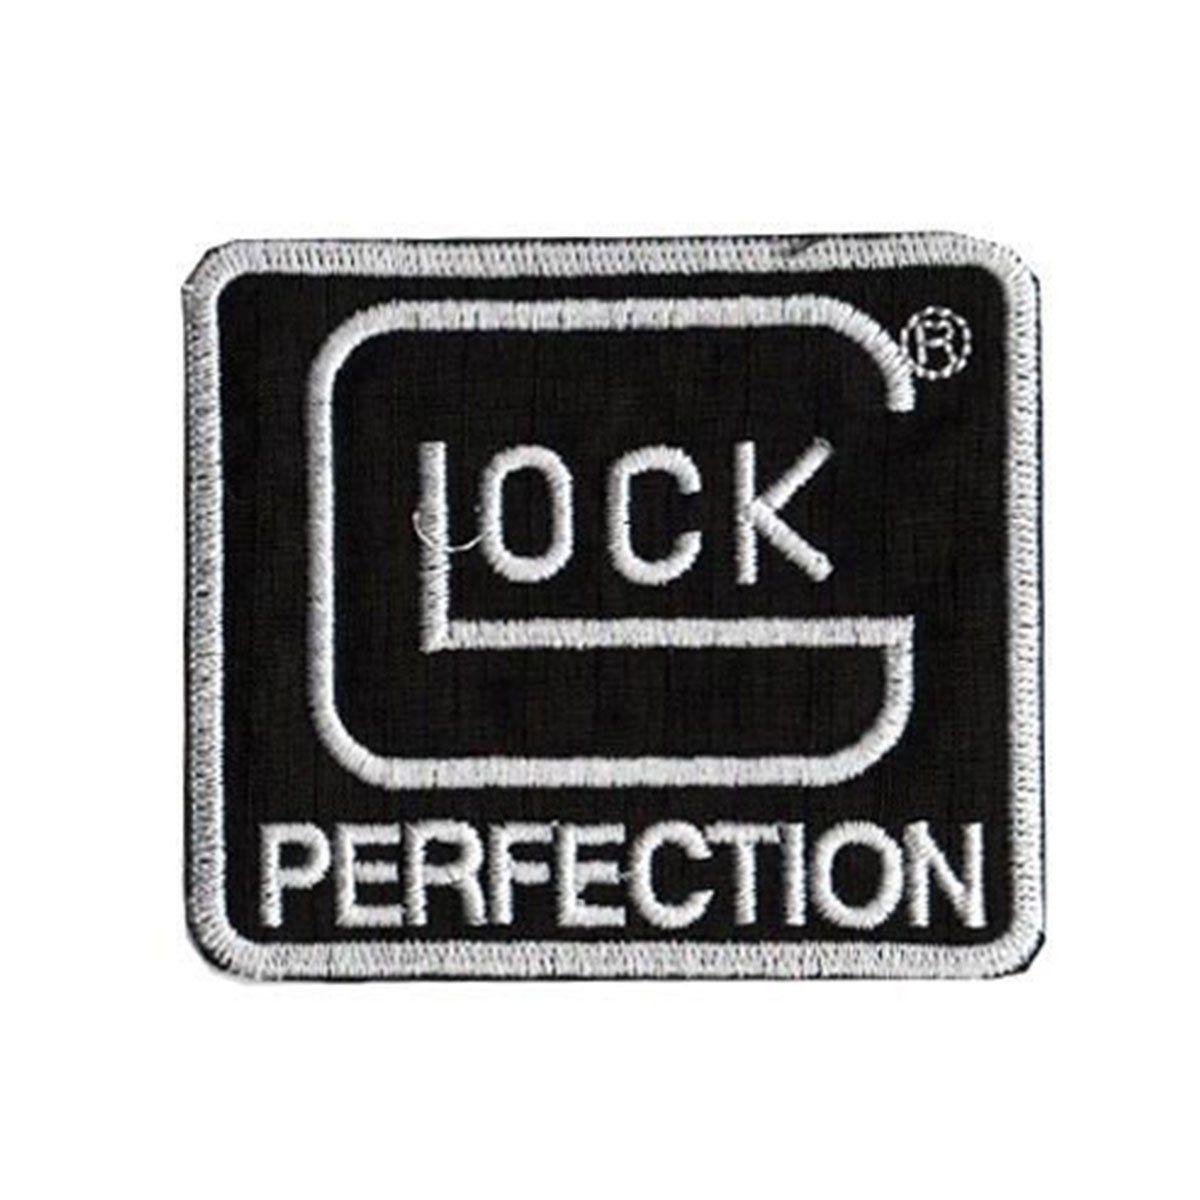 Bordado Termocolante Glock Perfection